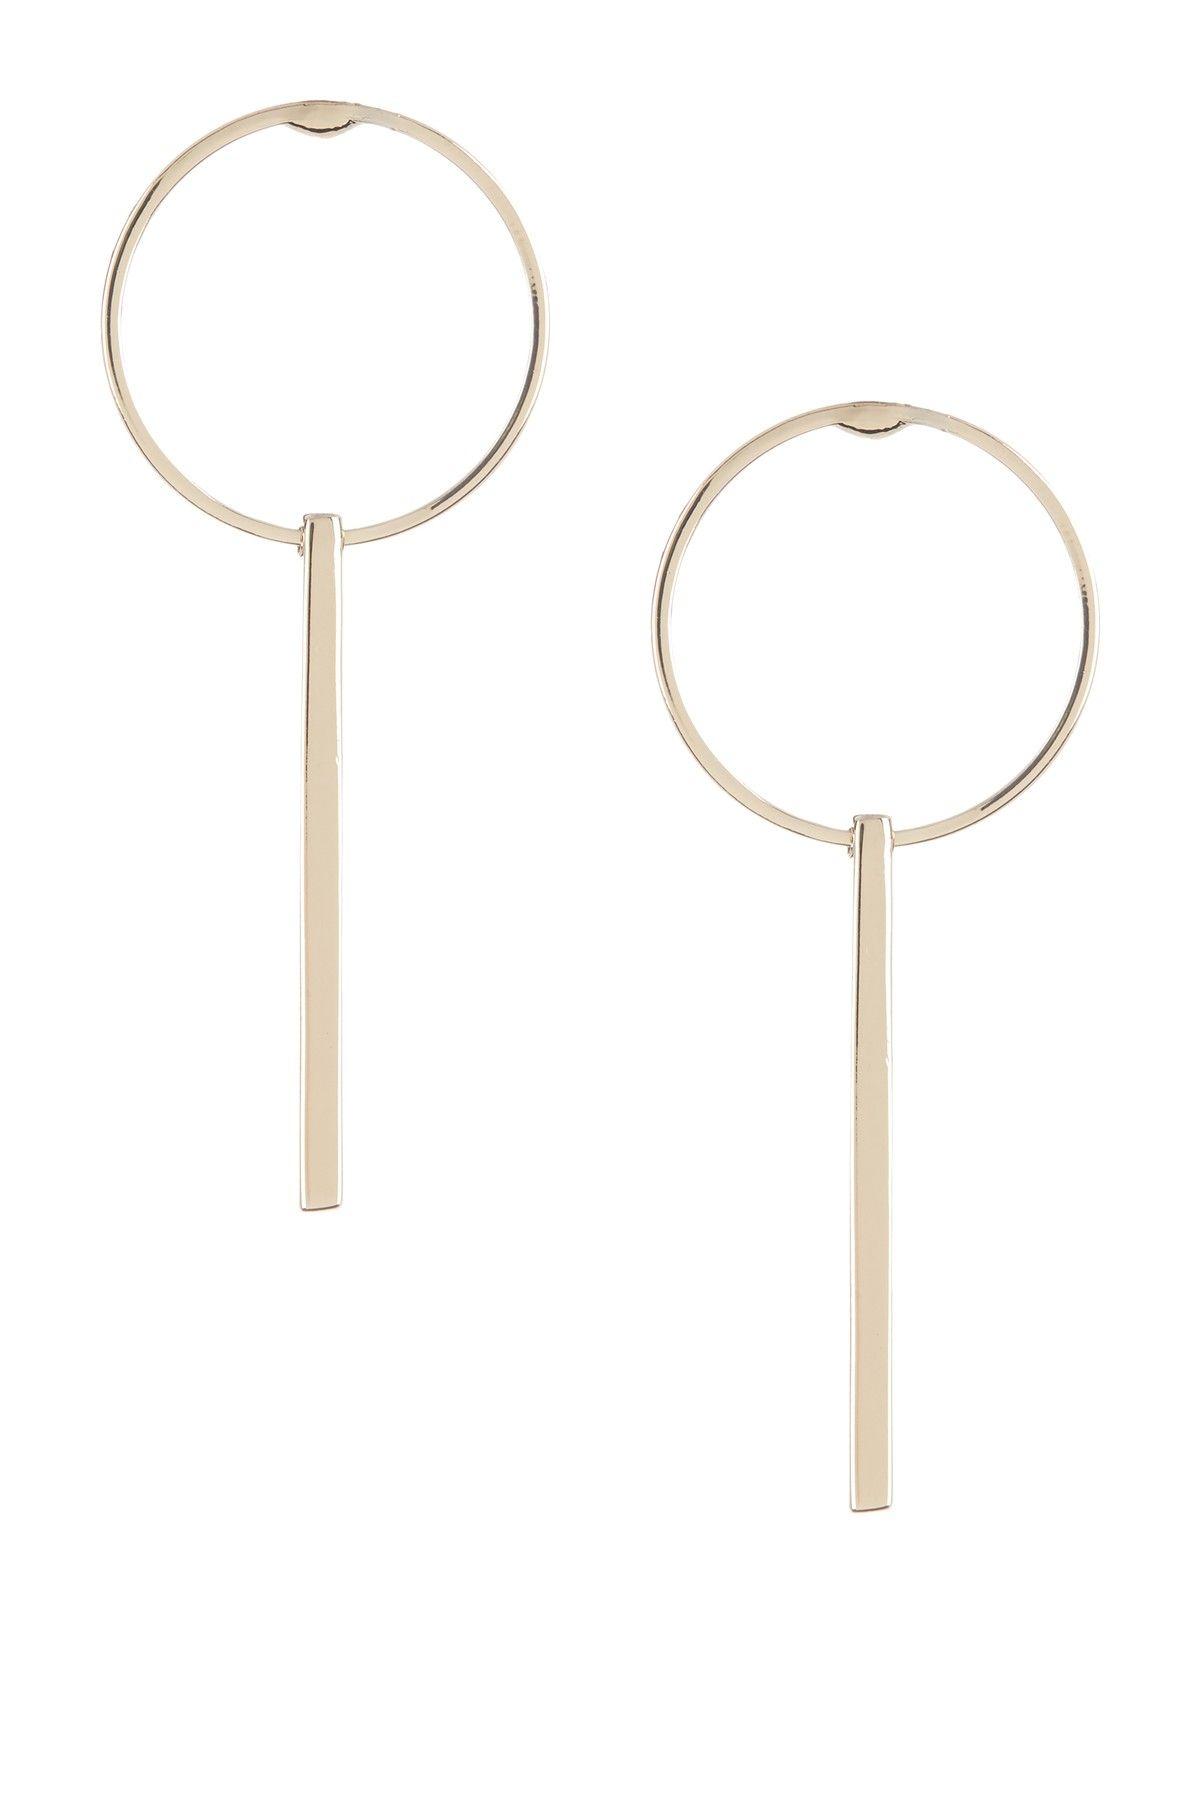 0565c66a5ffee Bar Drop Hoop Earrings | Geometric | Hoop earrings, Union bar, Earrings